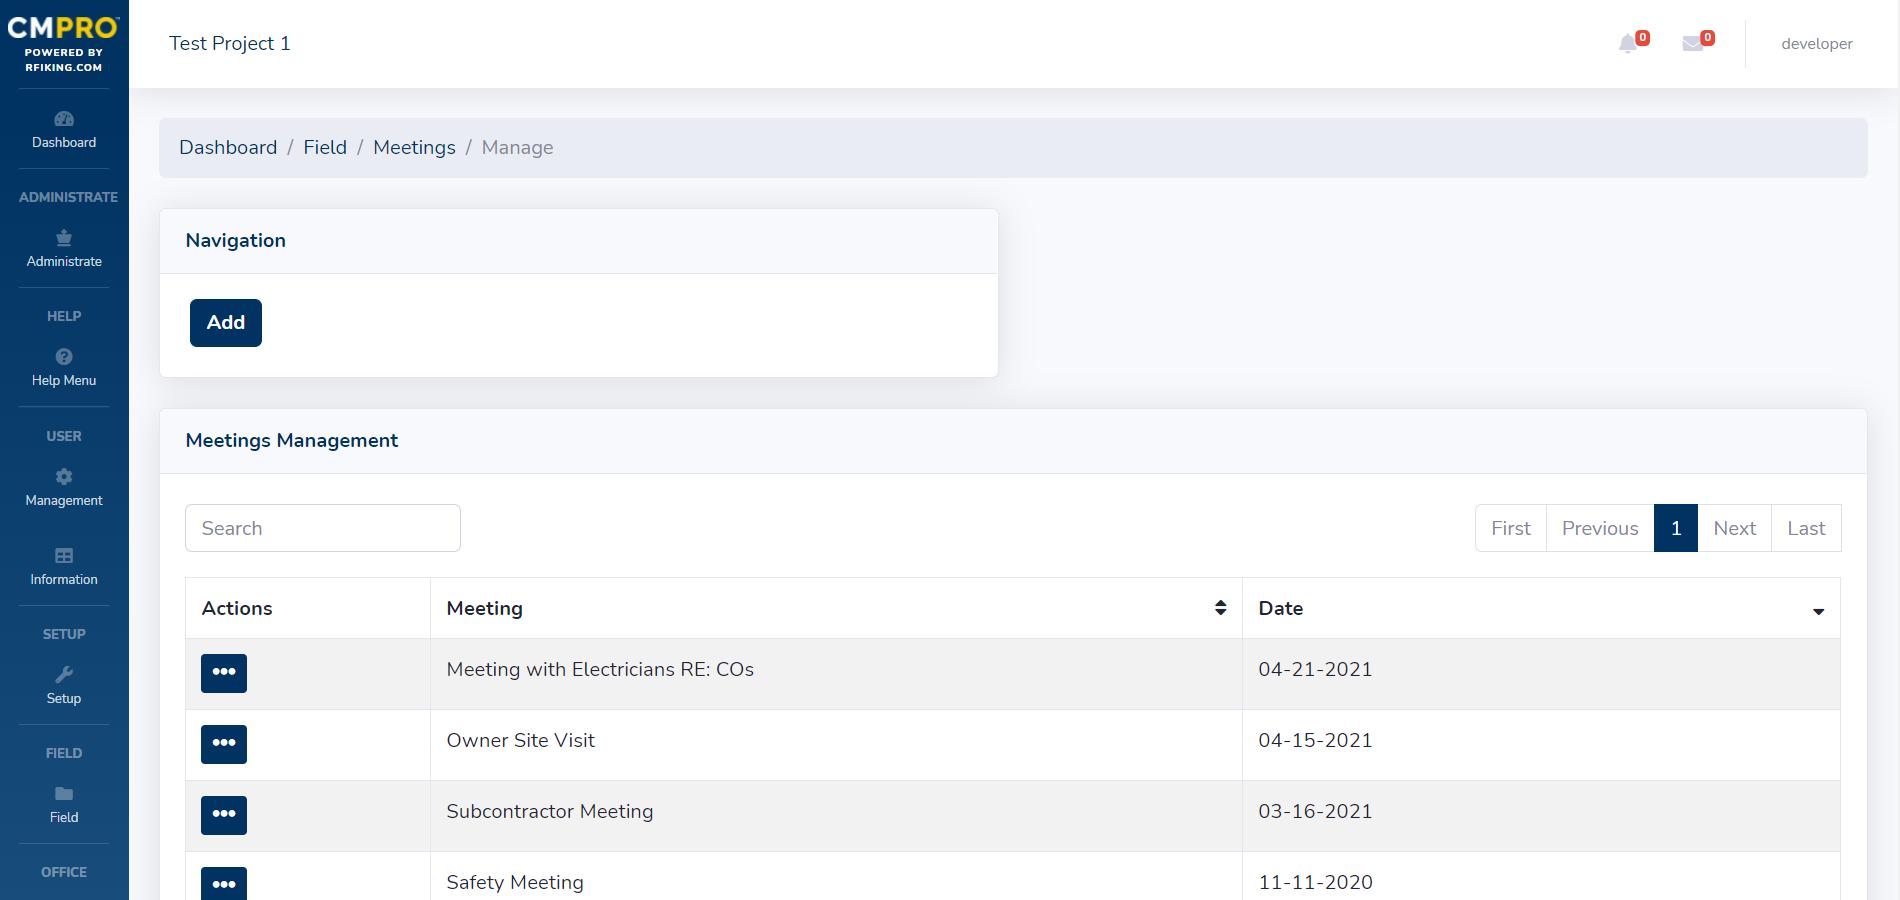 CMPRO General Contractor Meetings Management Dashboard